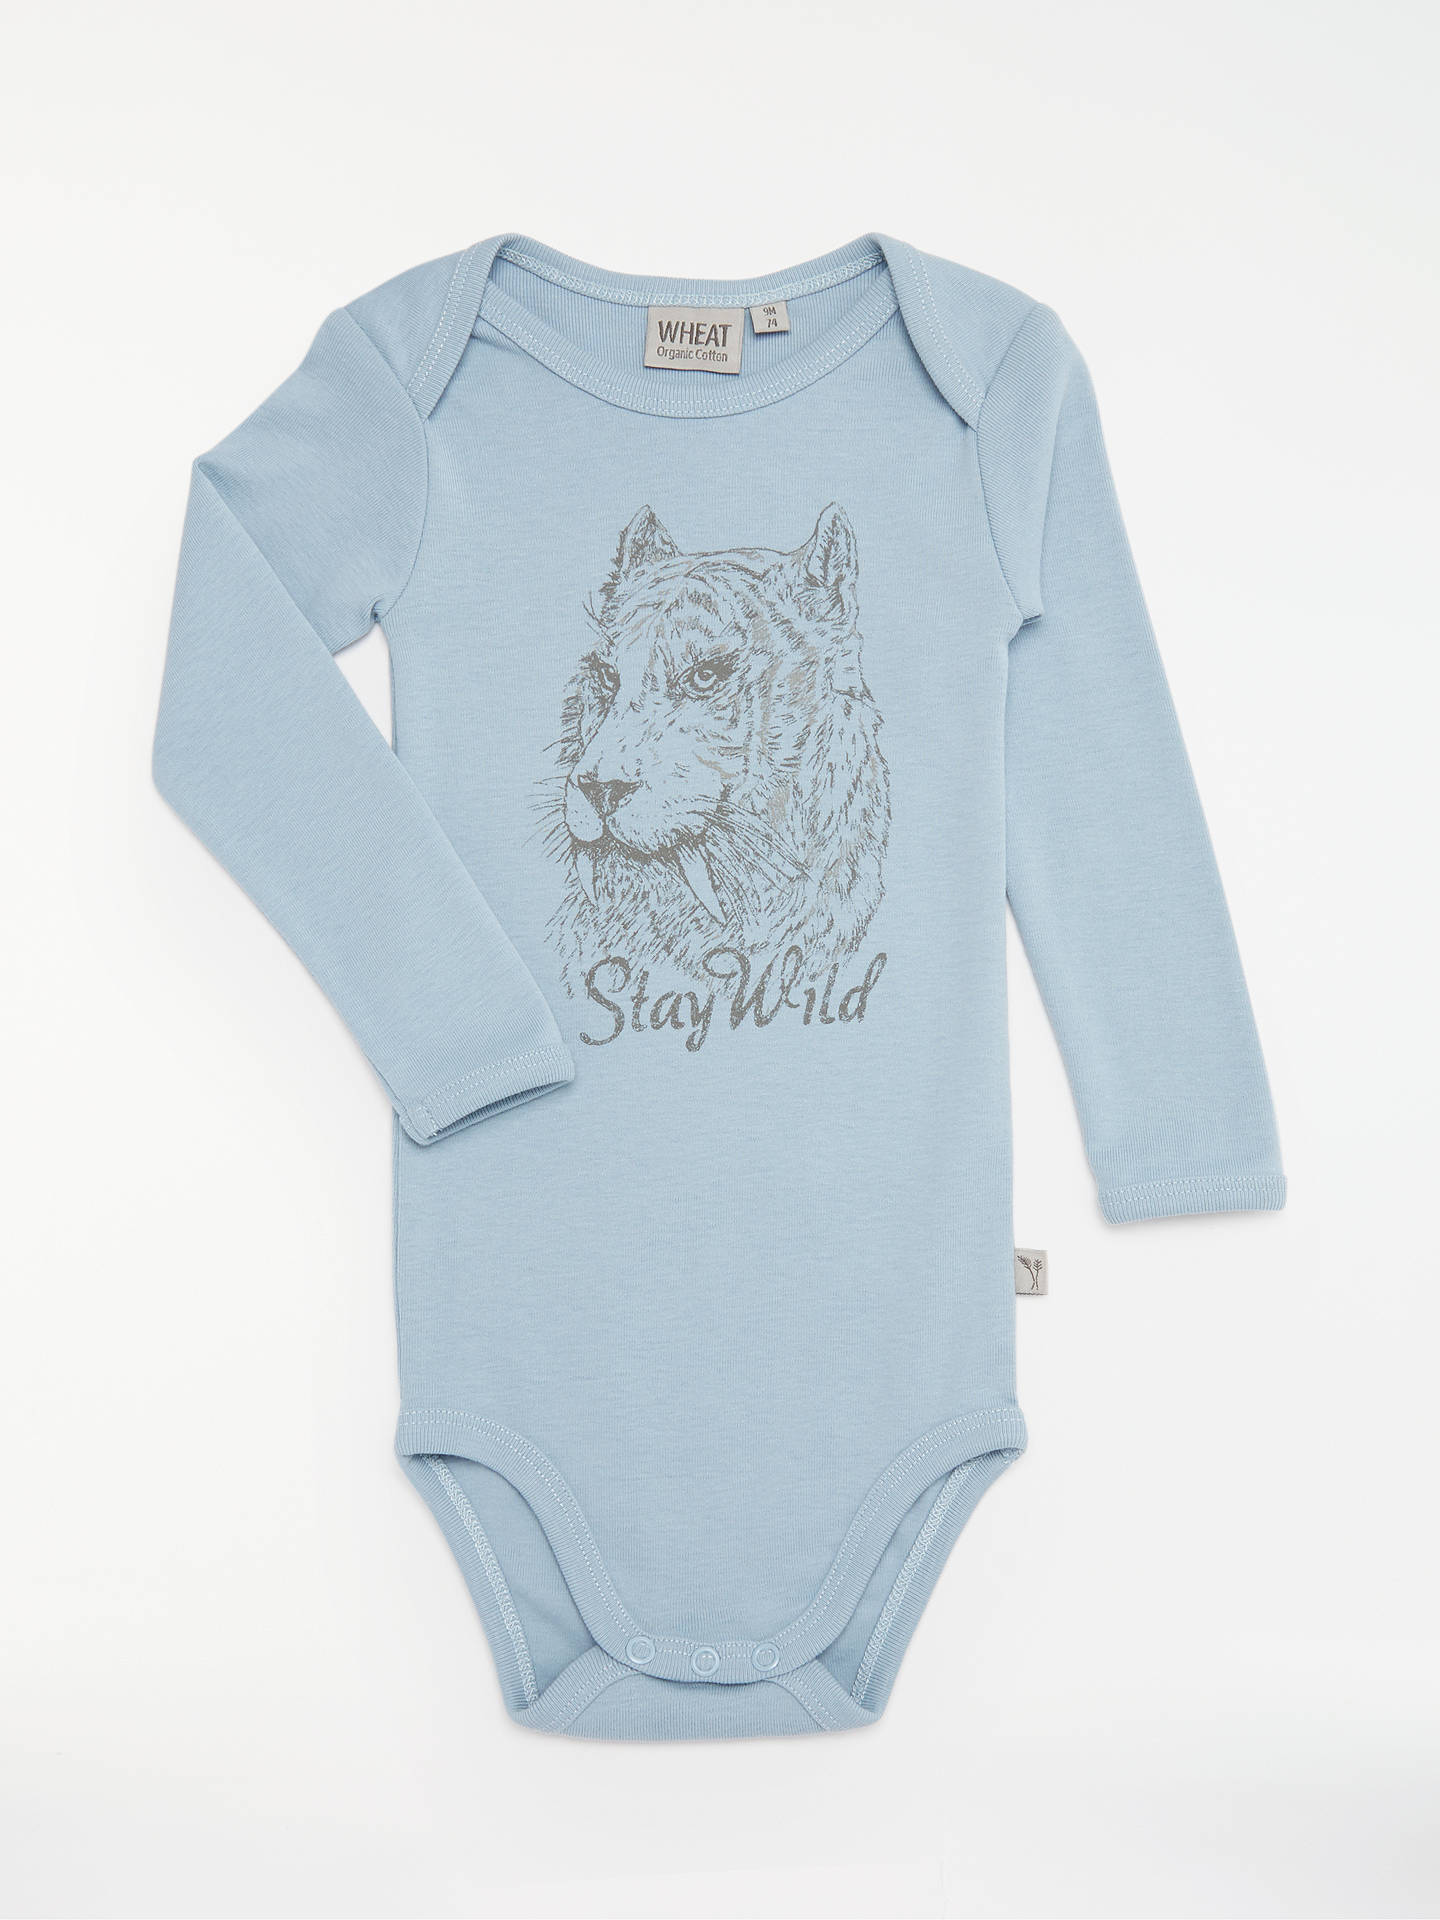 5e1d128c5bb7 Wheat Baby Tiger Long Sleeve Bodysuit